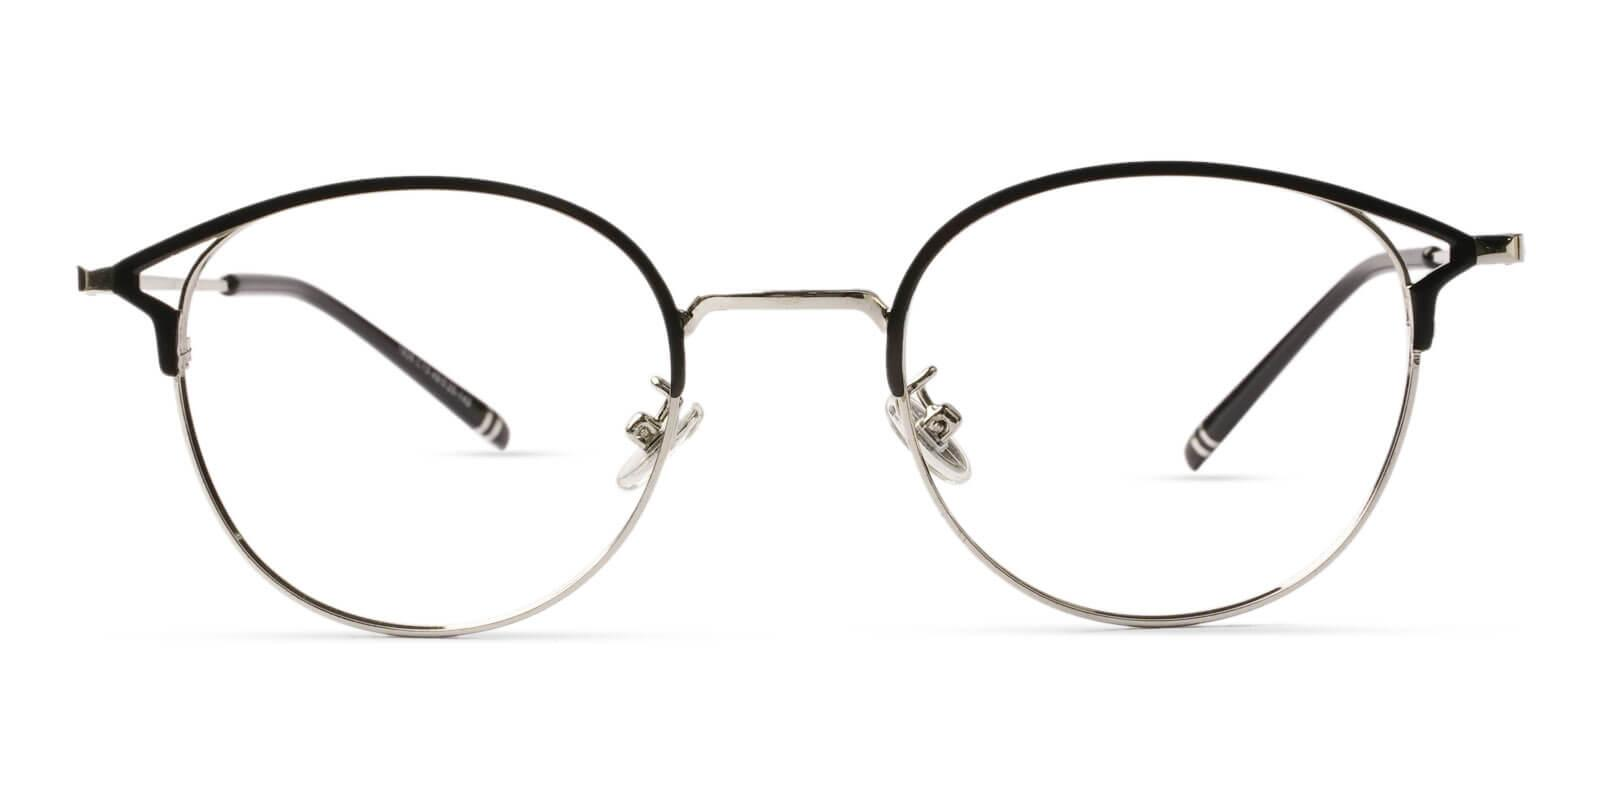 Haiti Silver Metal Eyeglasses , NosePads Frames from ABBE Glasses